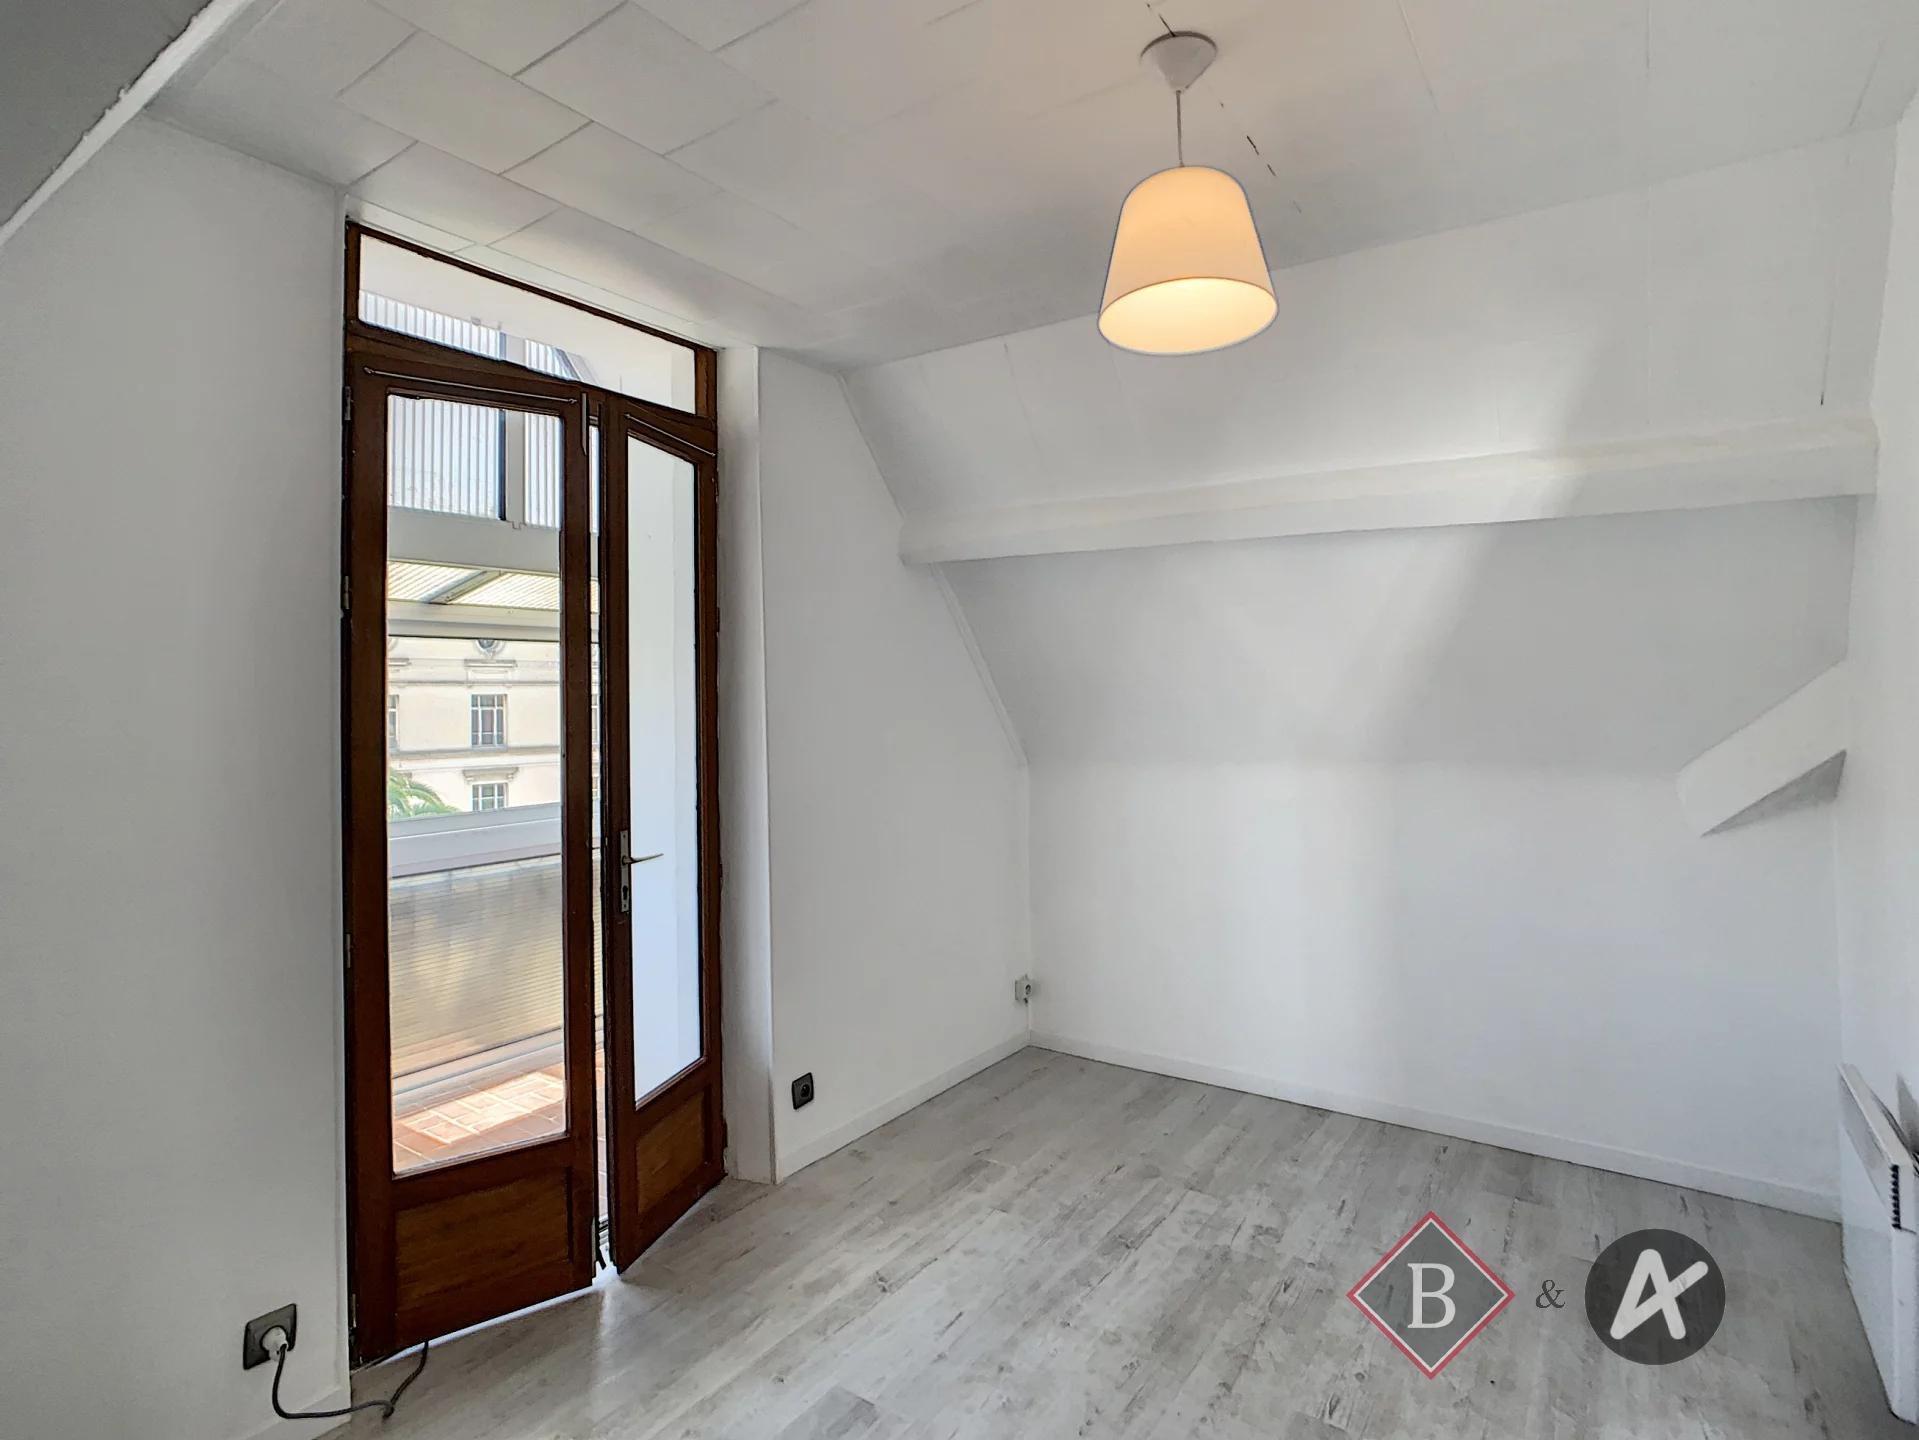 Cannes - Petit Juas - 1 bedroom renovated